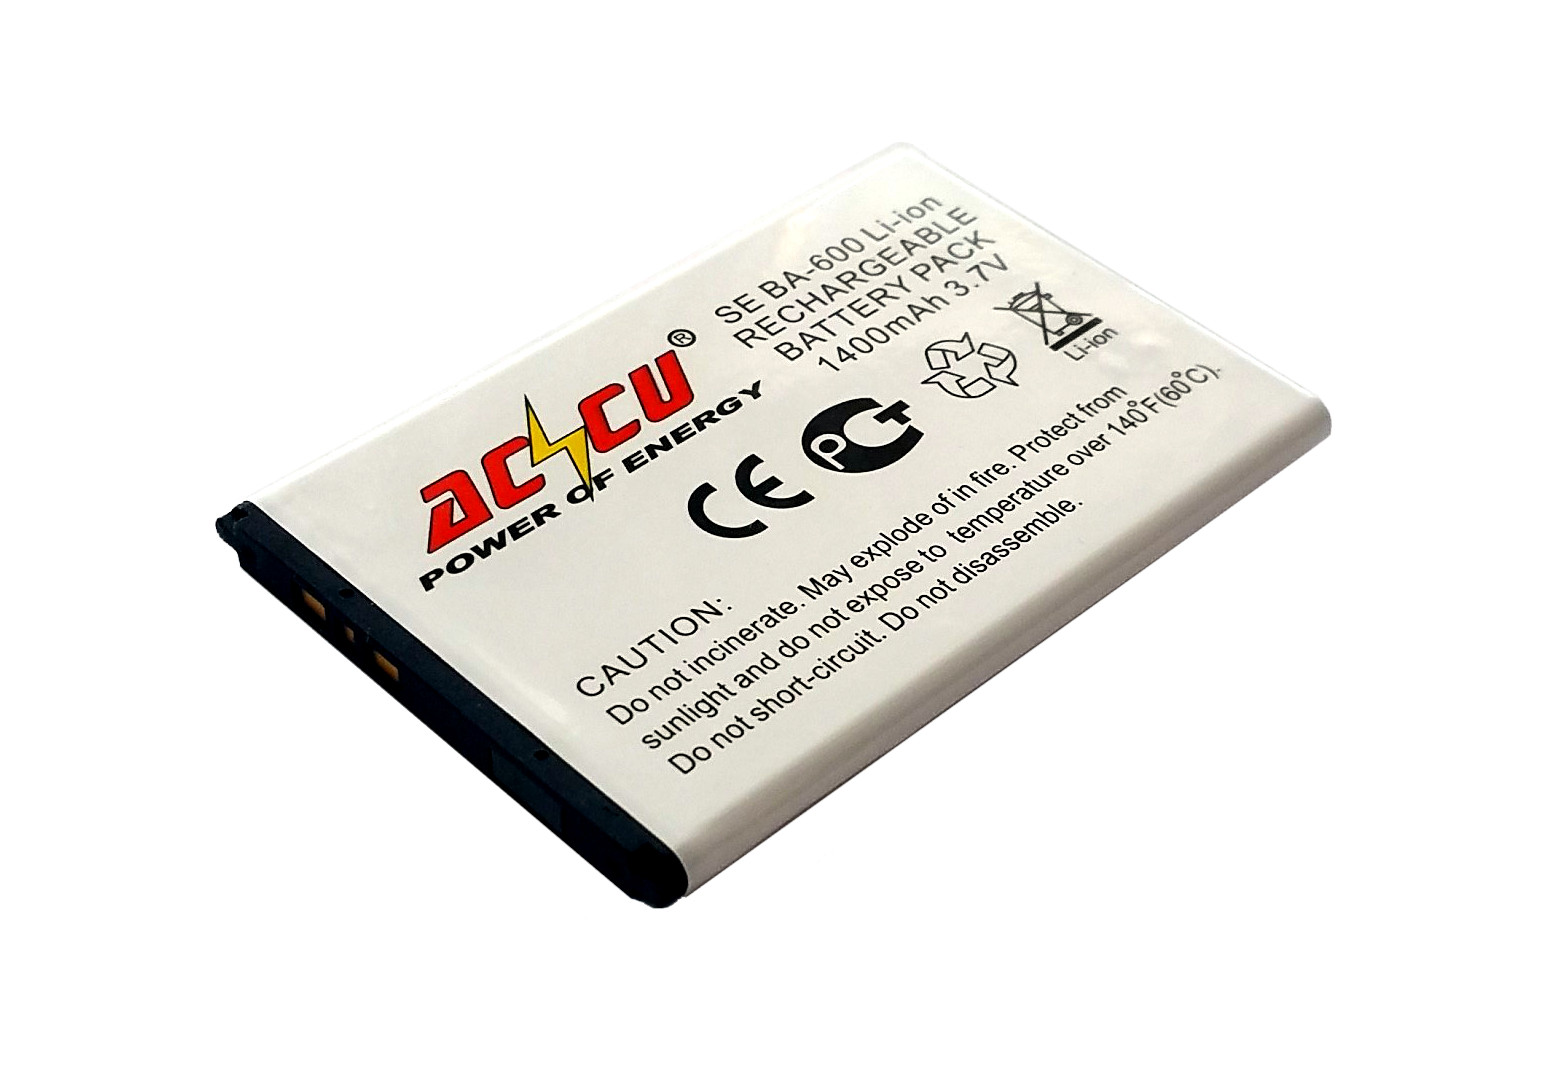 Baterie Accu pro Sony Ericsson Xperia U, Li-ion, 1400mAh